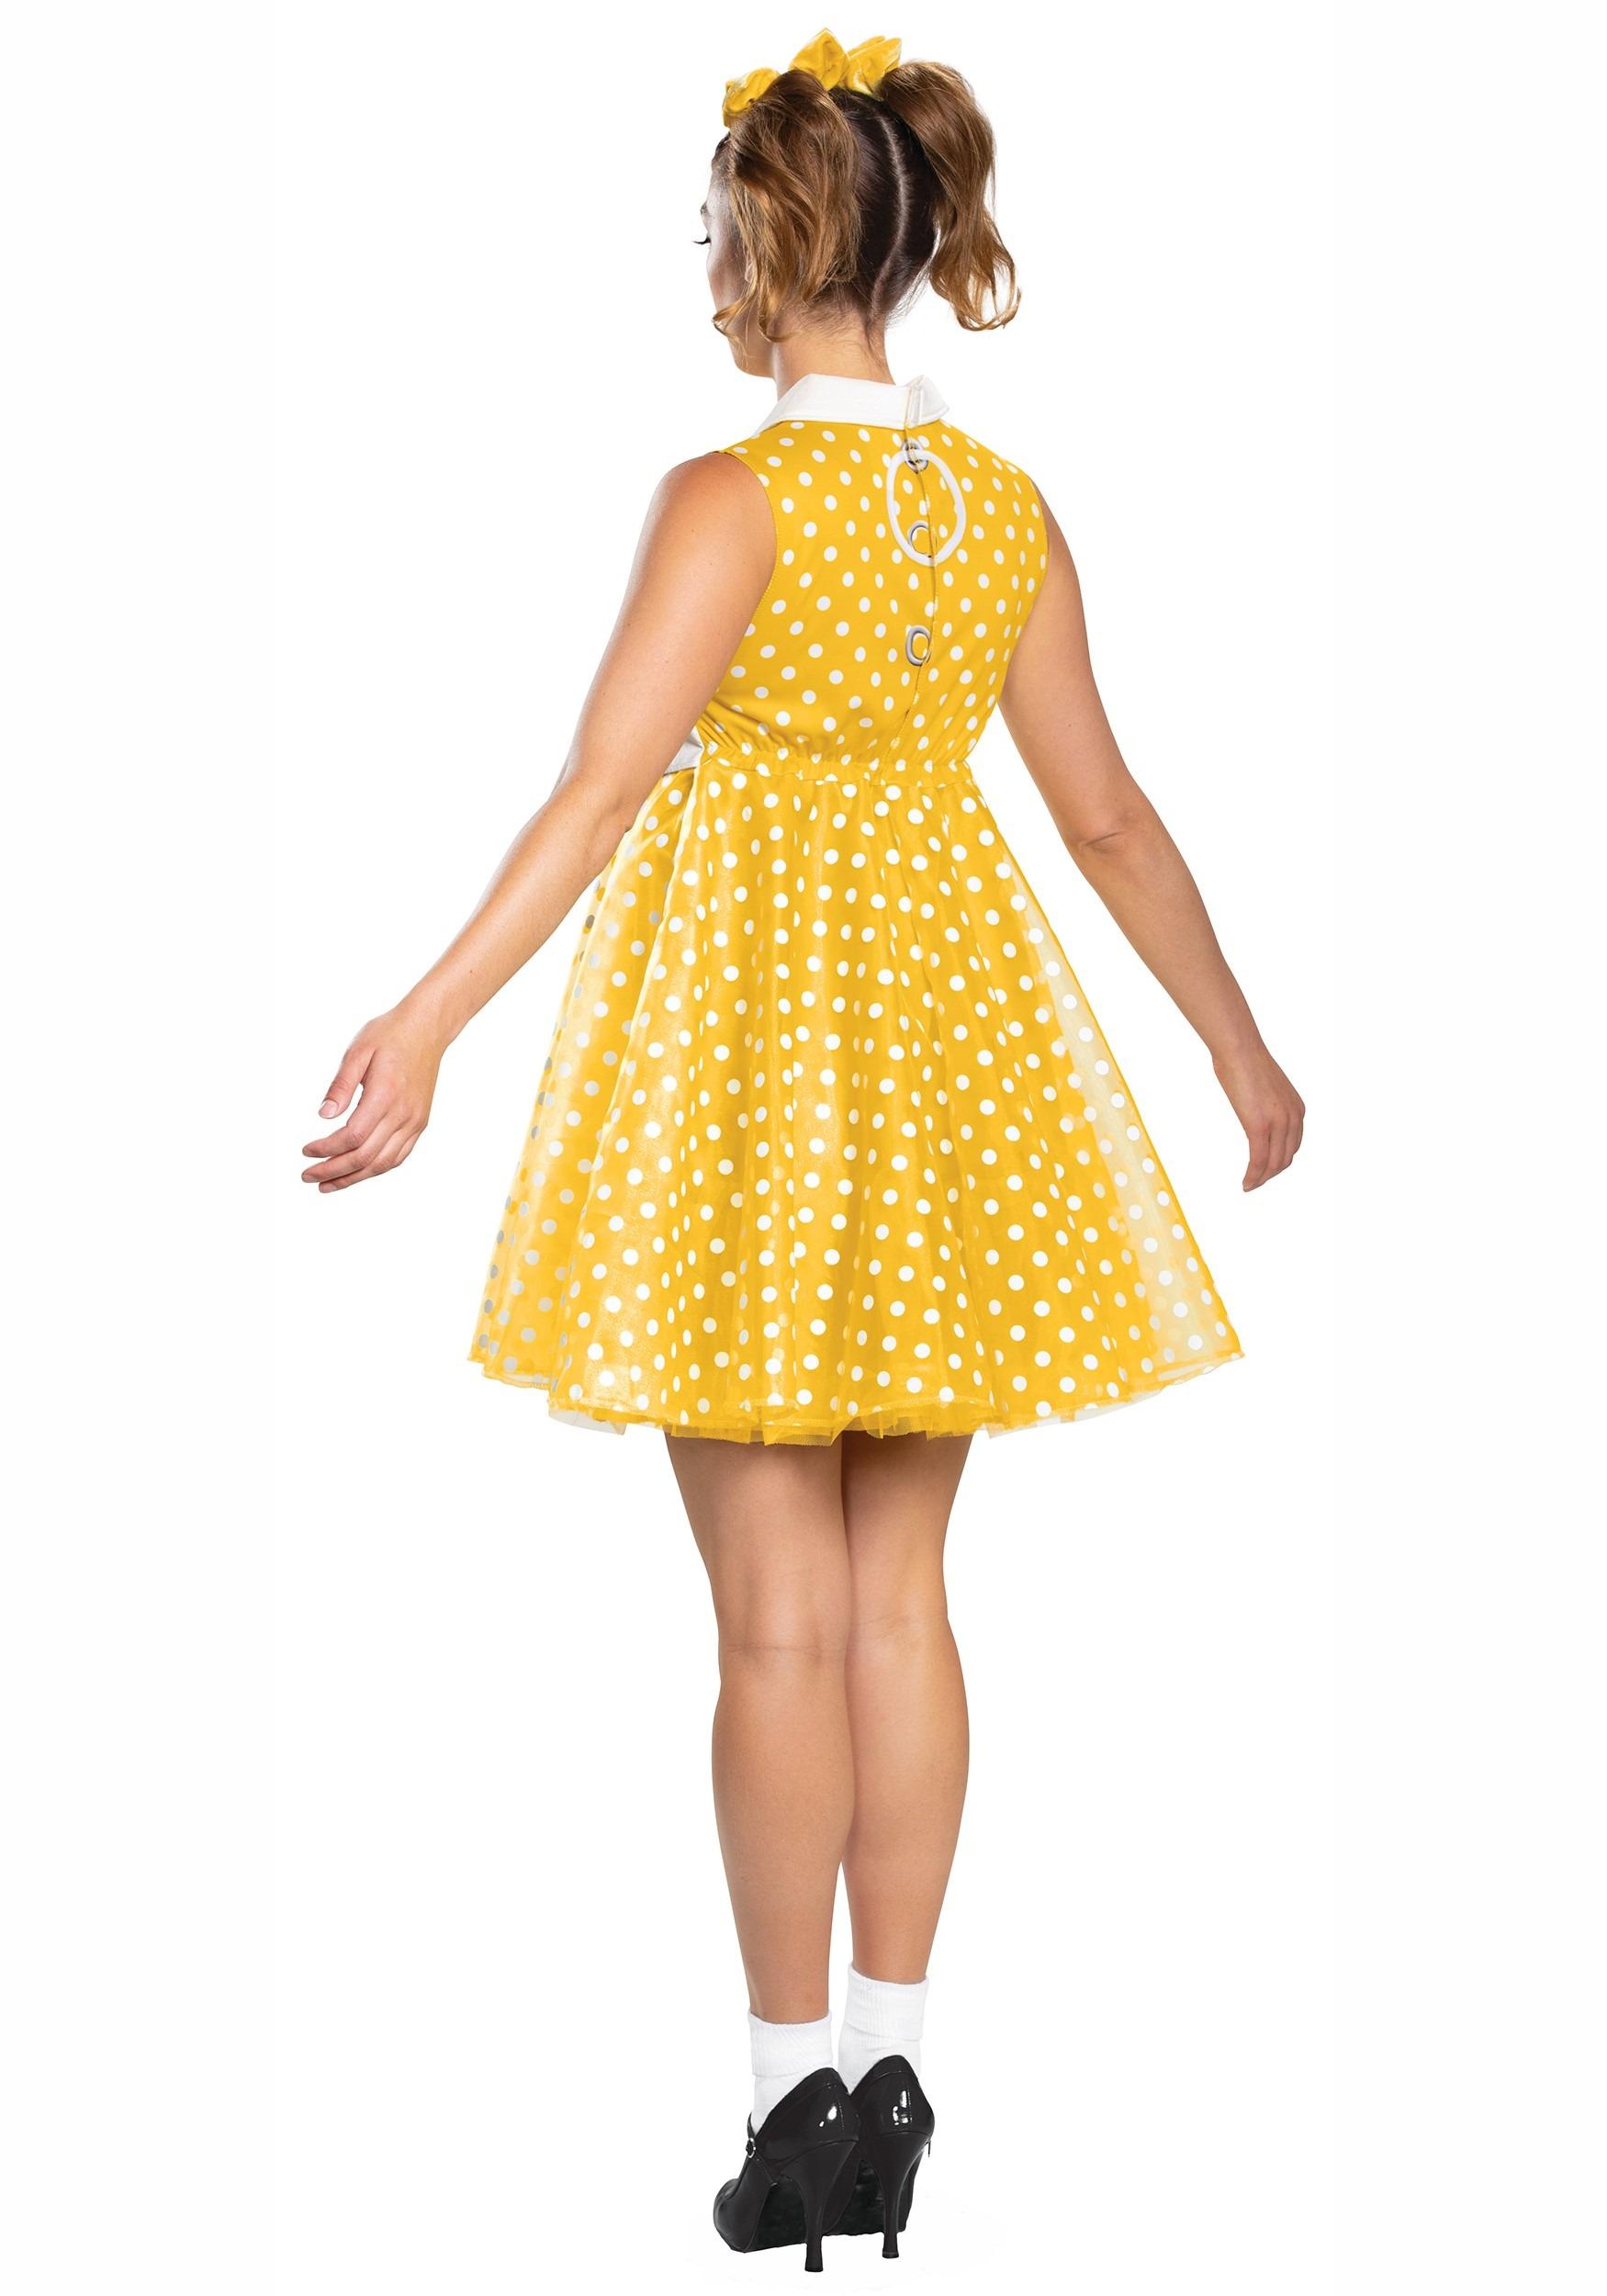 Women's Gabby Gabby Toy Story Deluxe Costume